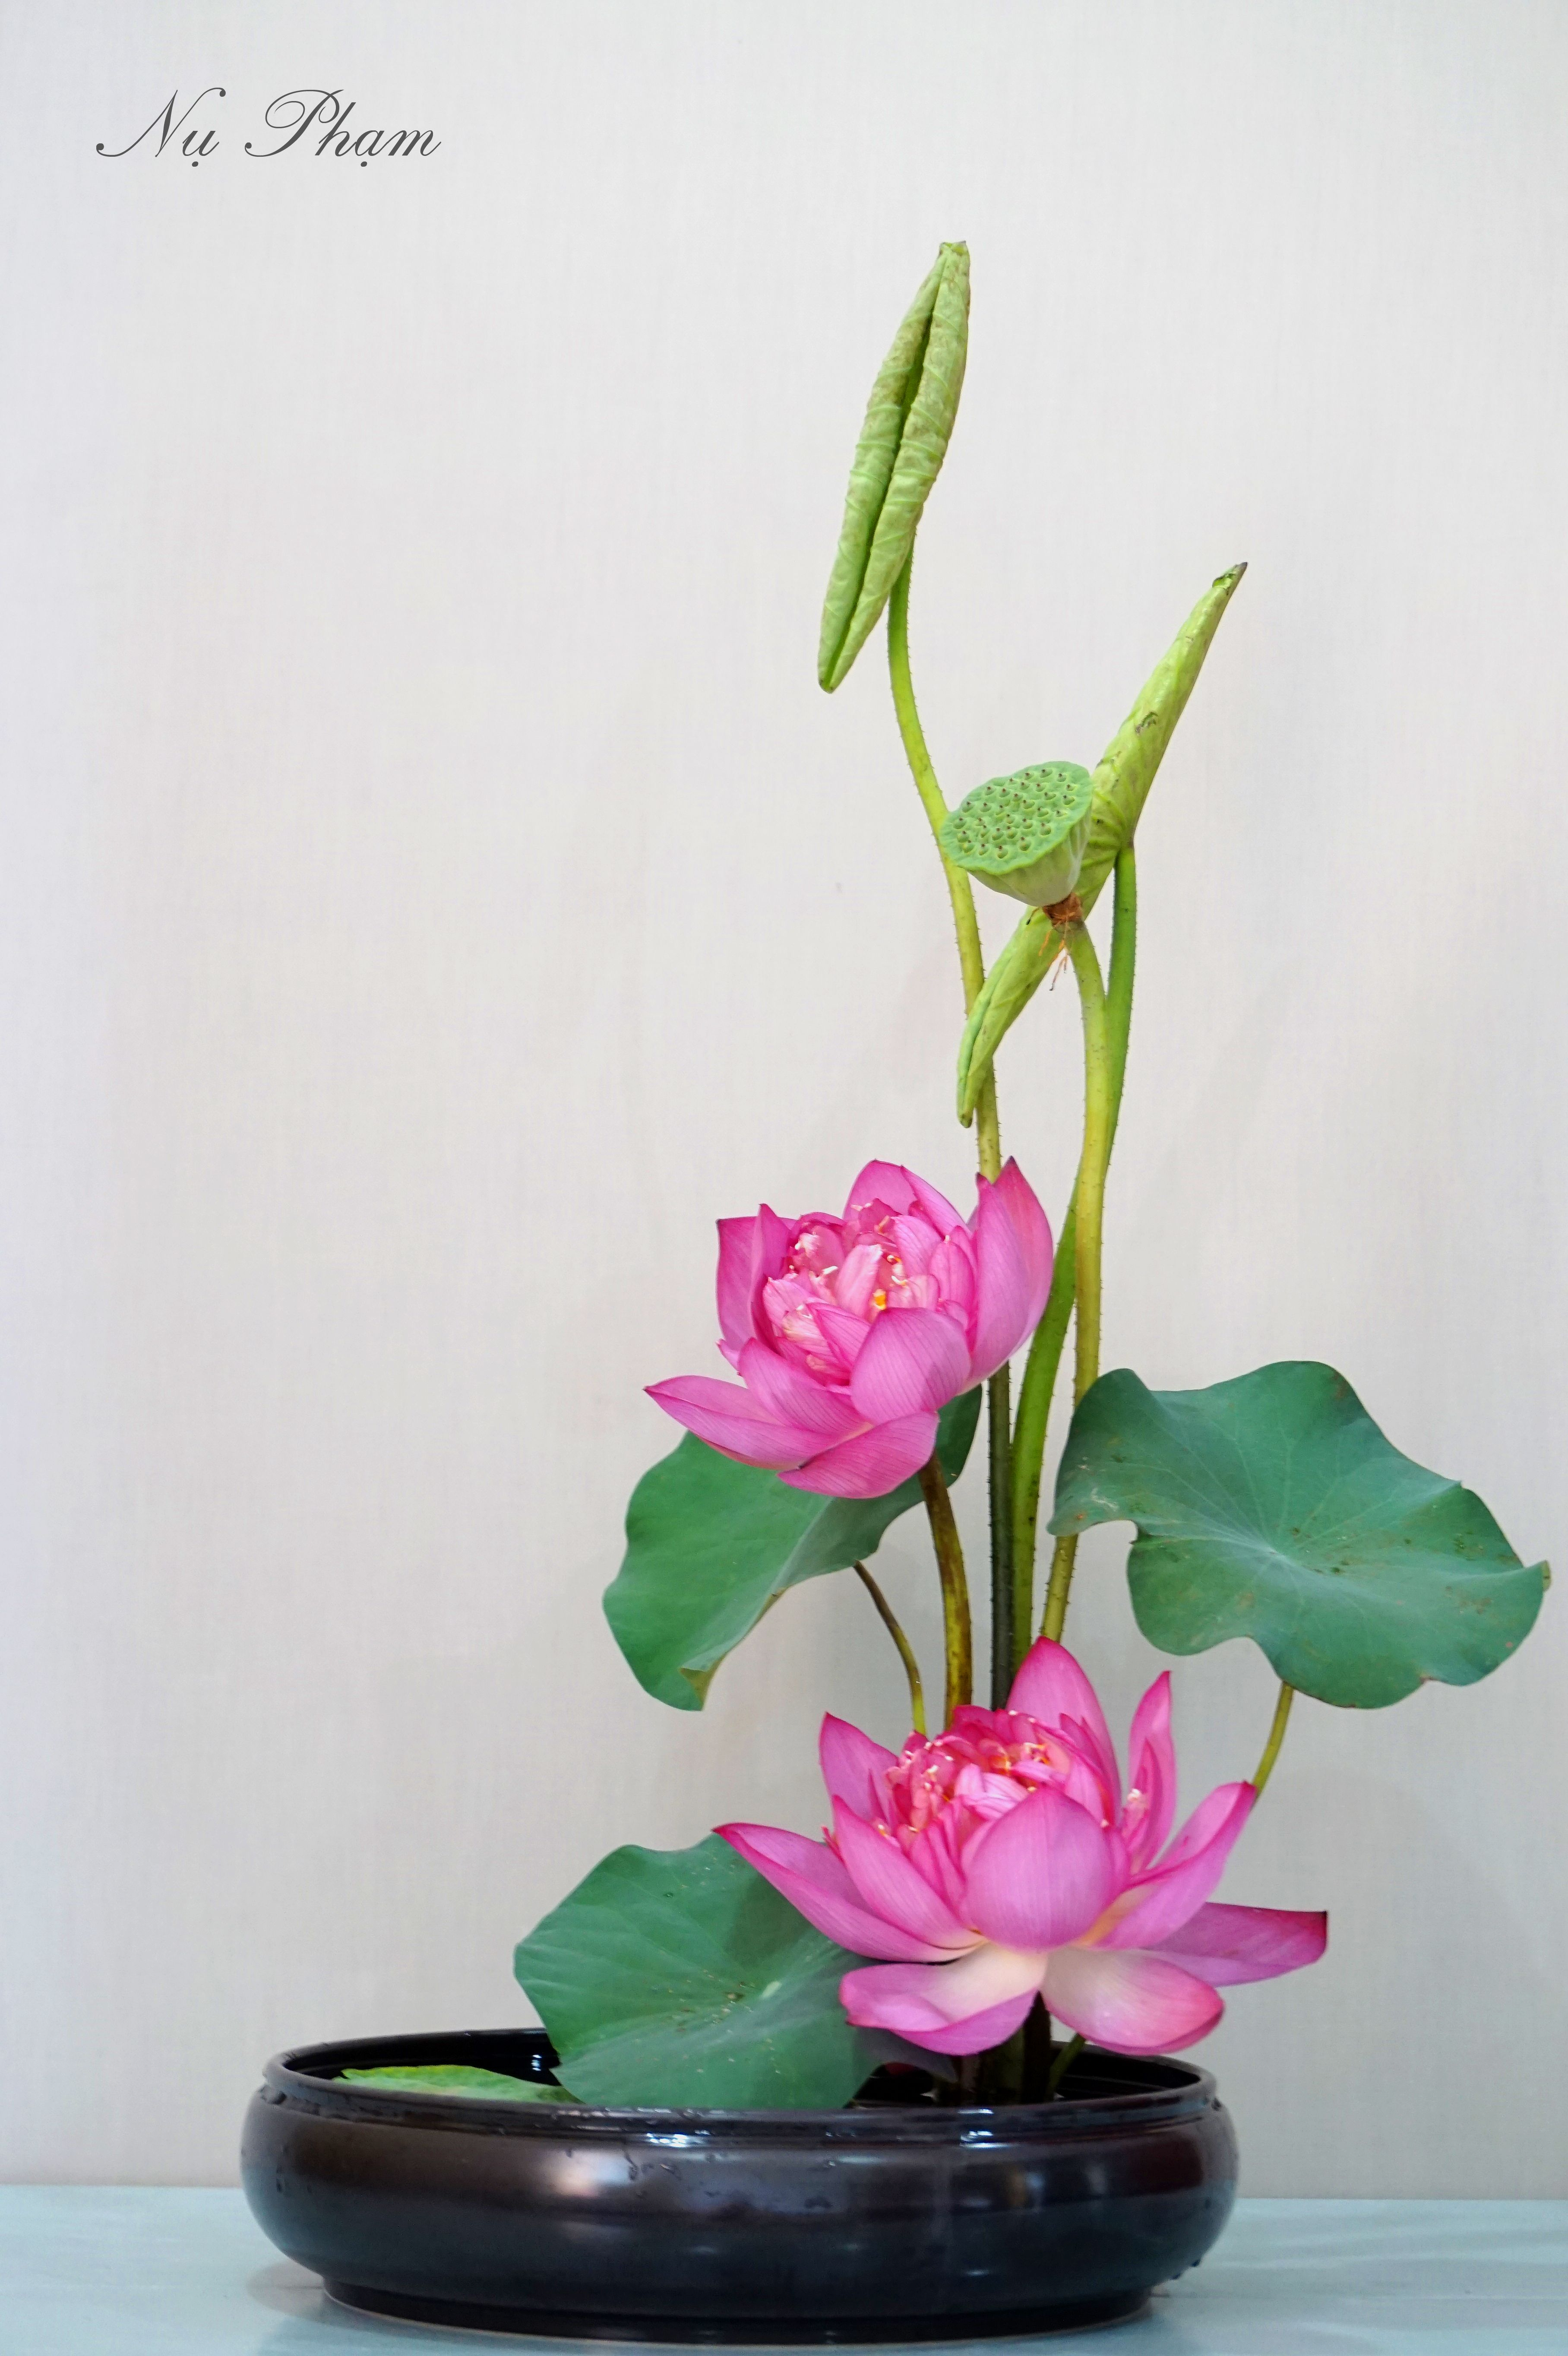 Ikebana Lotus Flower Lotus Pinterest Ikebana Flowers And